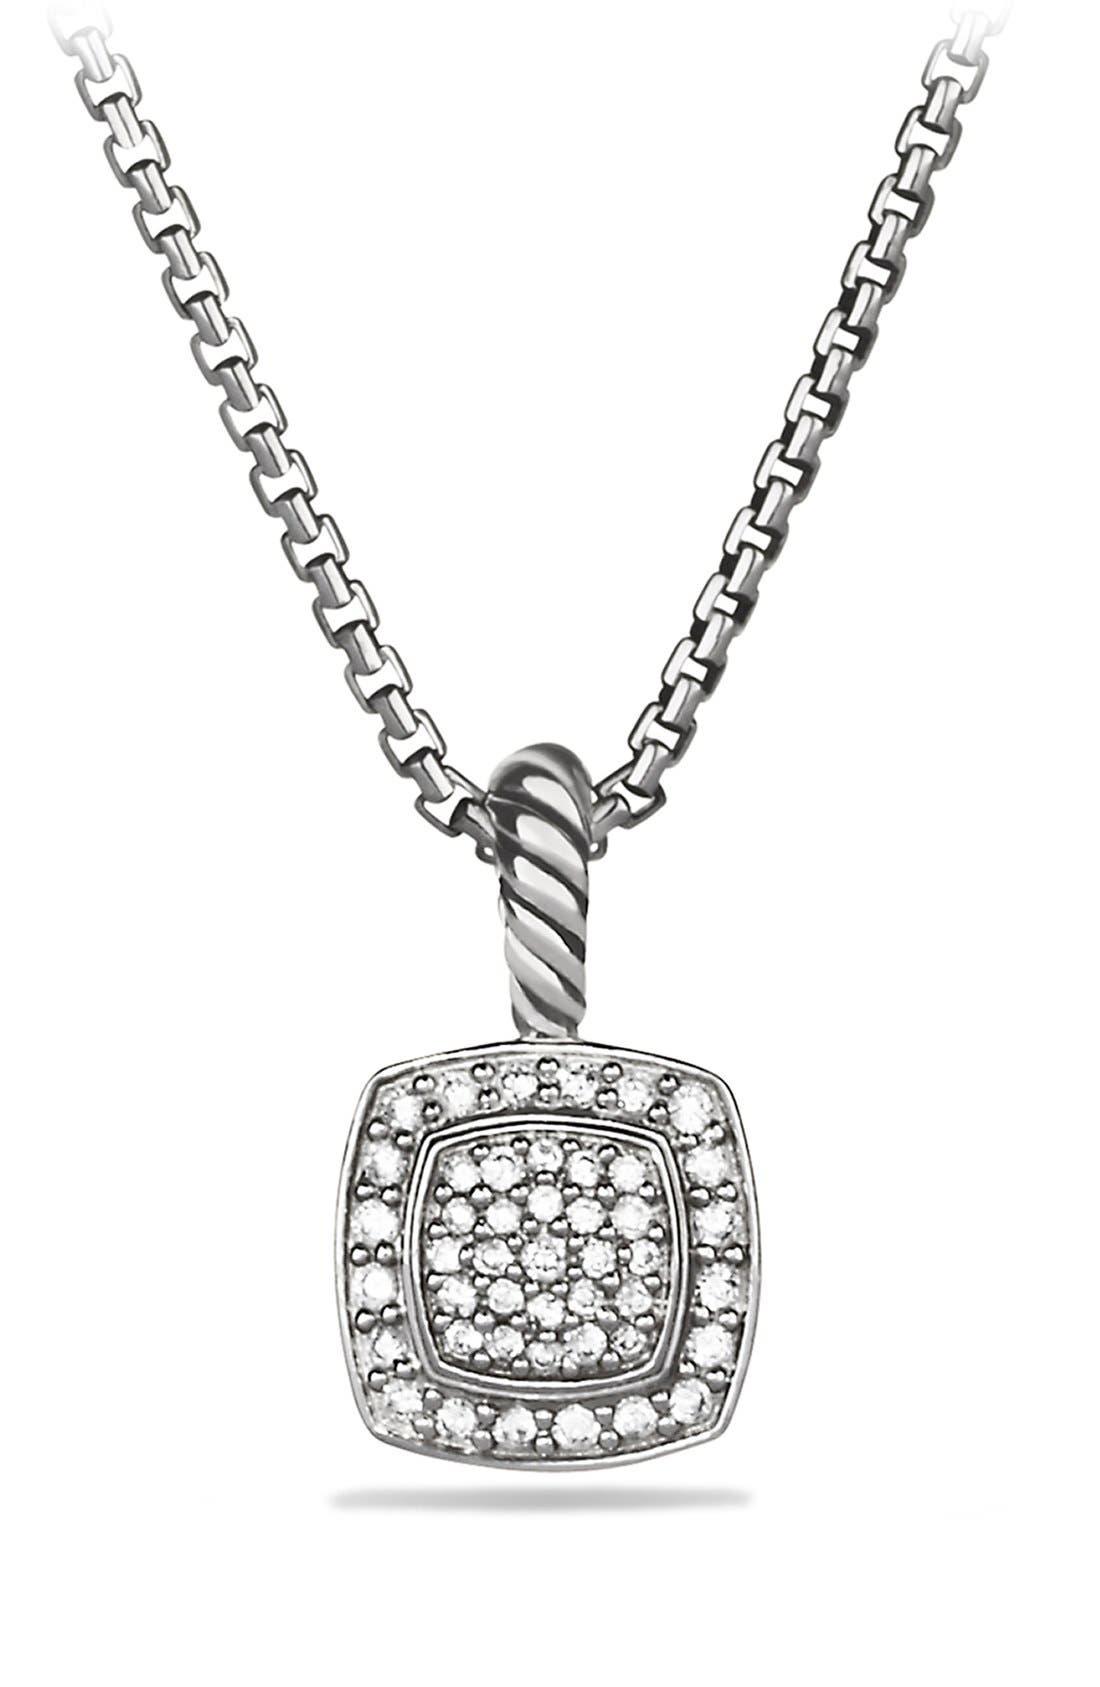 'Albion' Petite Pendant with Diamonds on Chain,                             Main thumbnail 1, color,                             Diamond